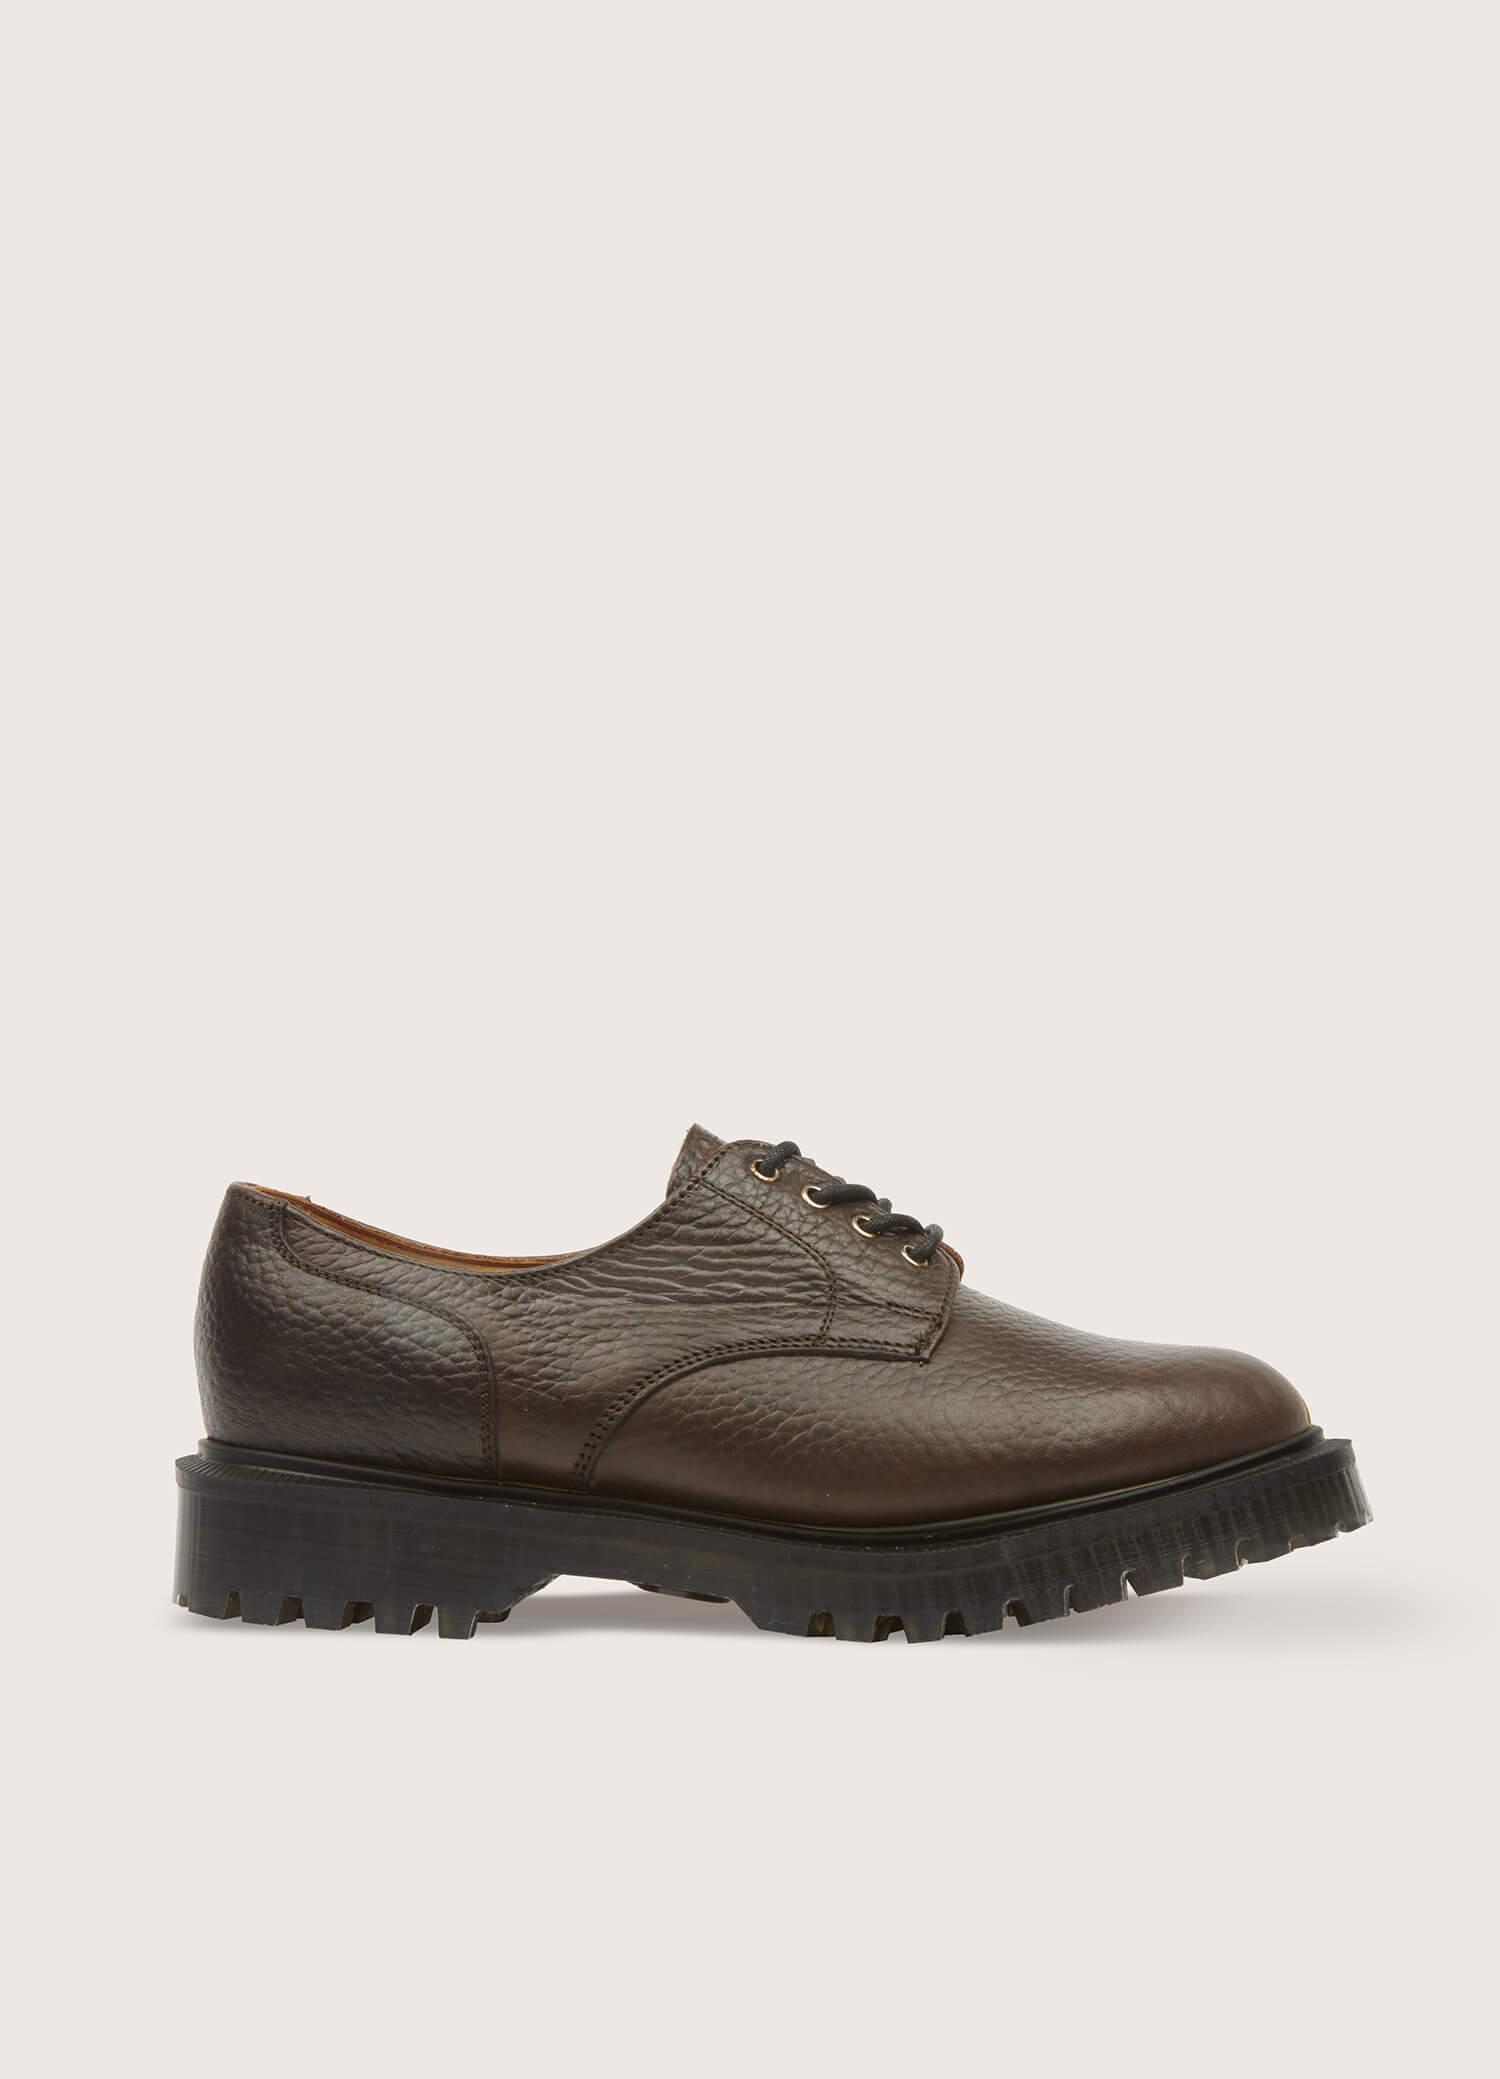 Solovair x YMC Women's Gibson Leather Shoes Dark Brown